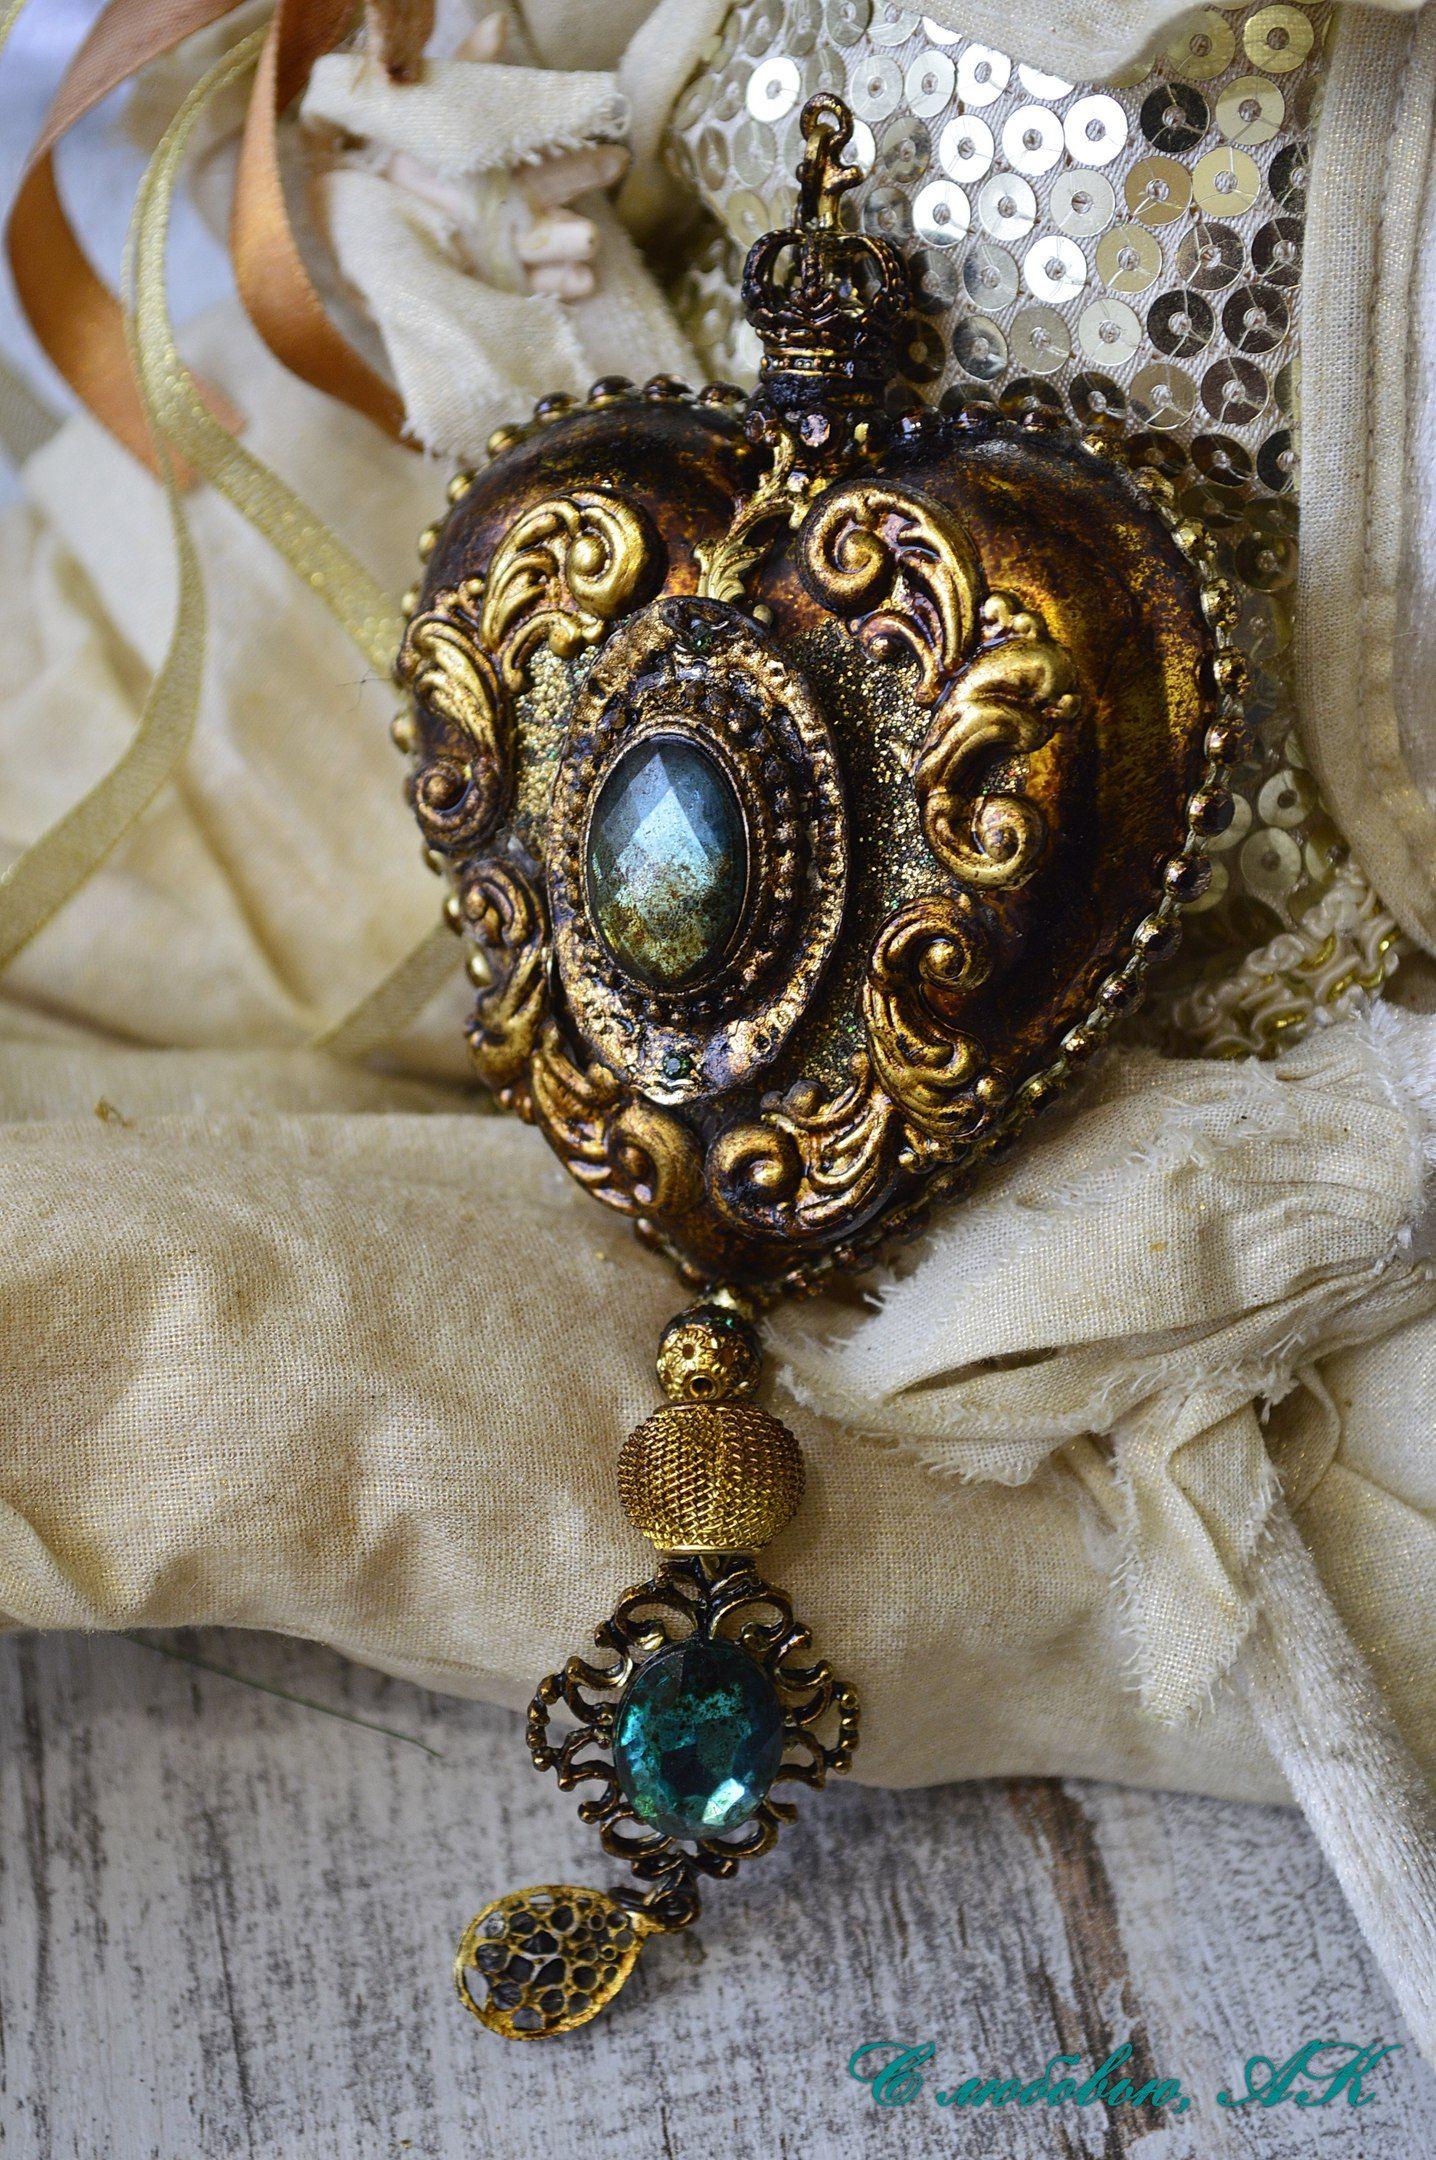 Heart Imagesdecoupage Ideaschristmas Ornamentschristmas Craftschristmas